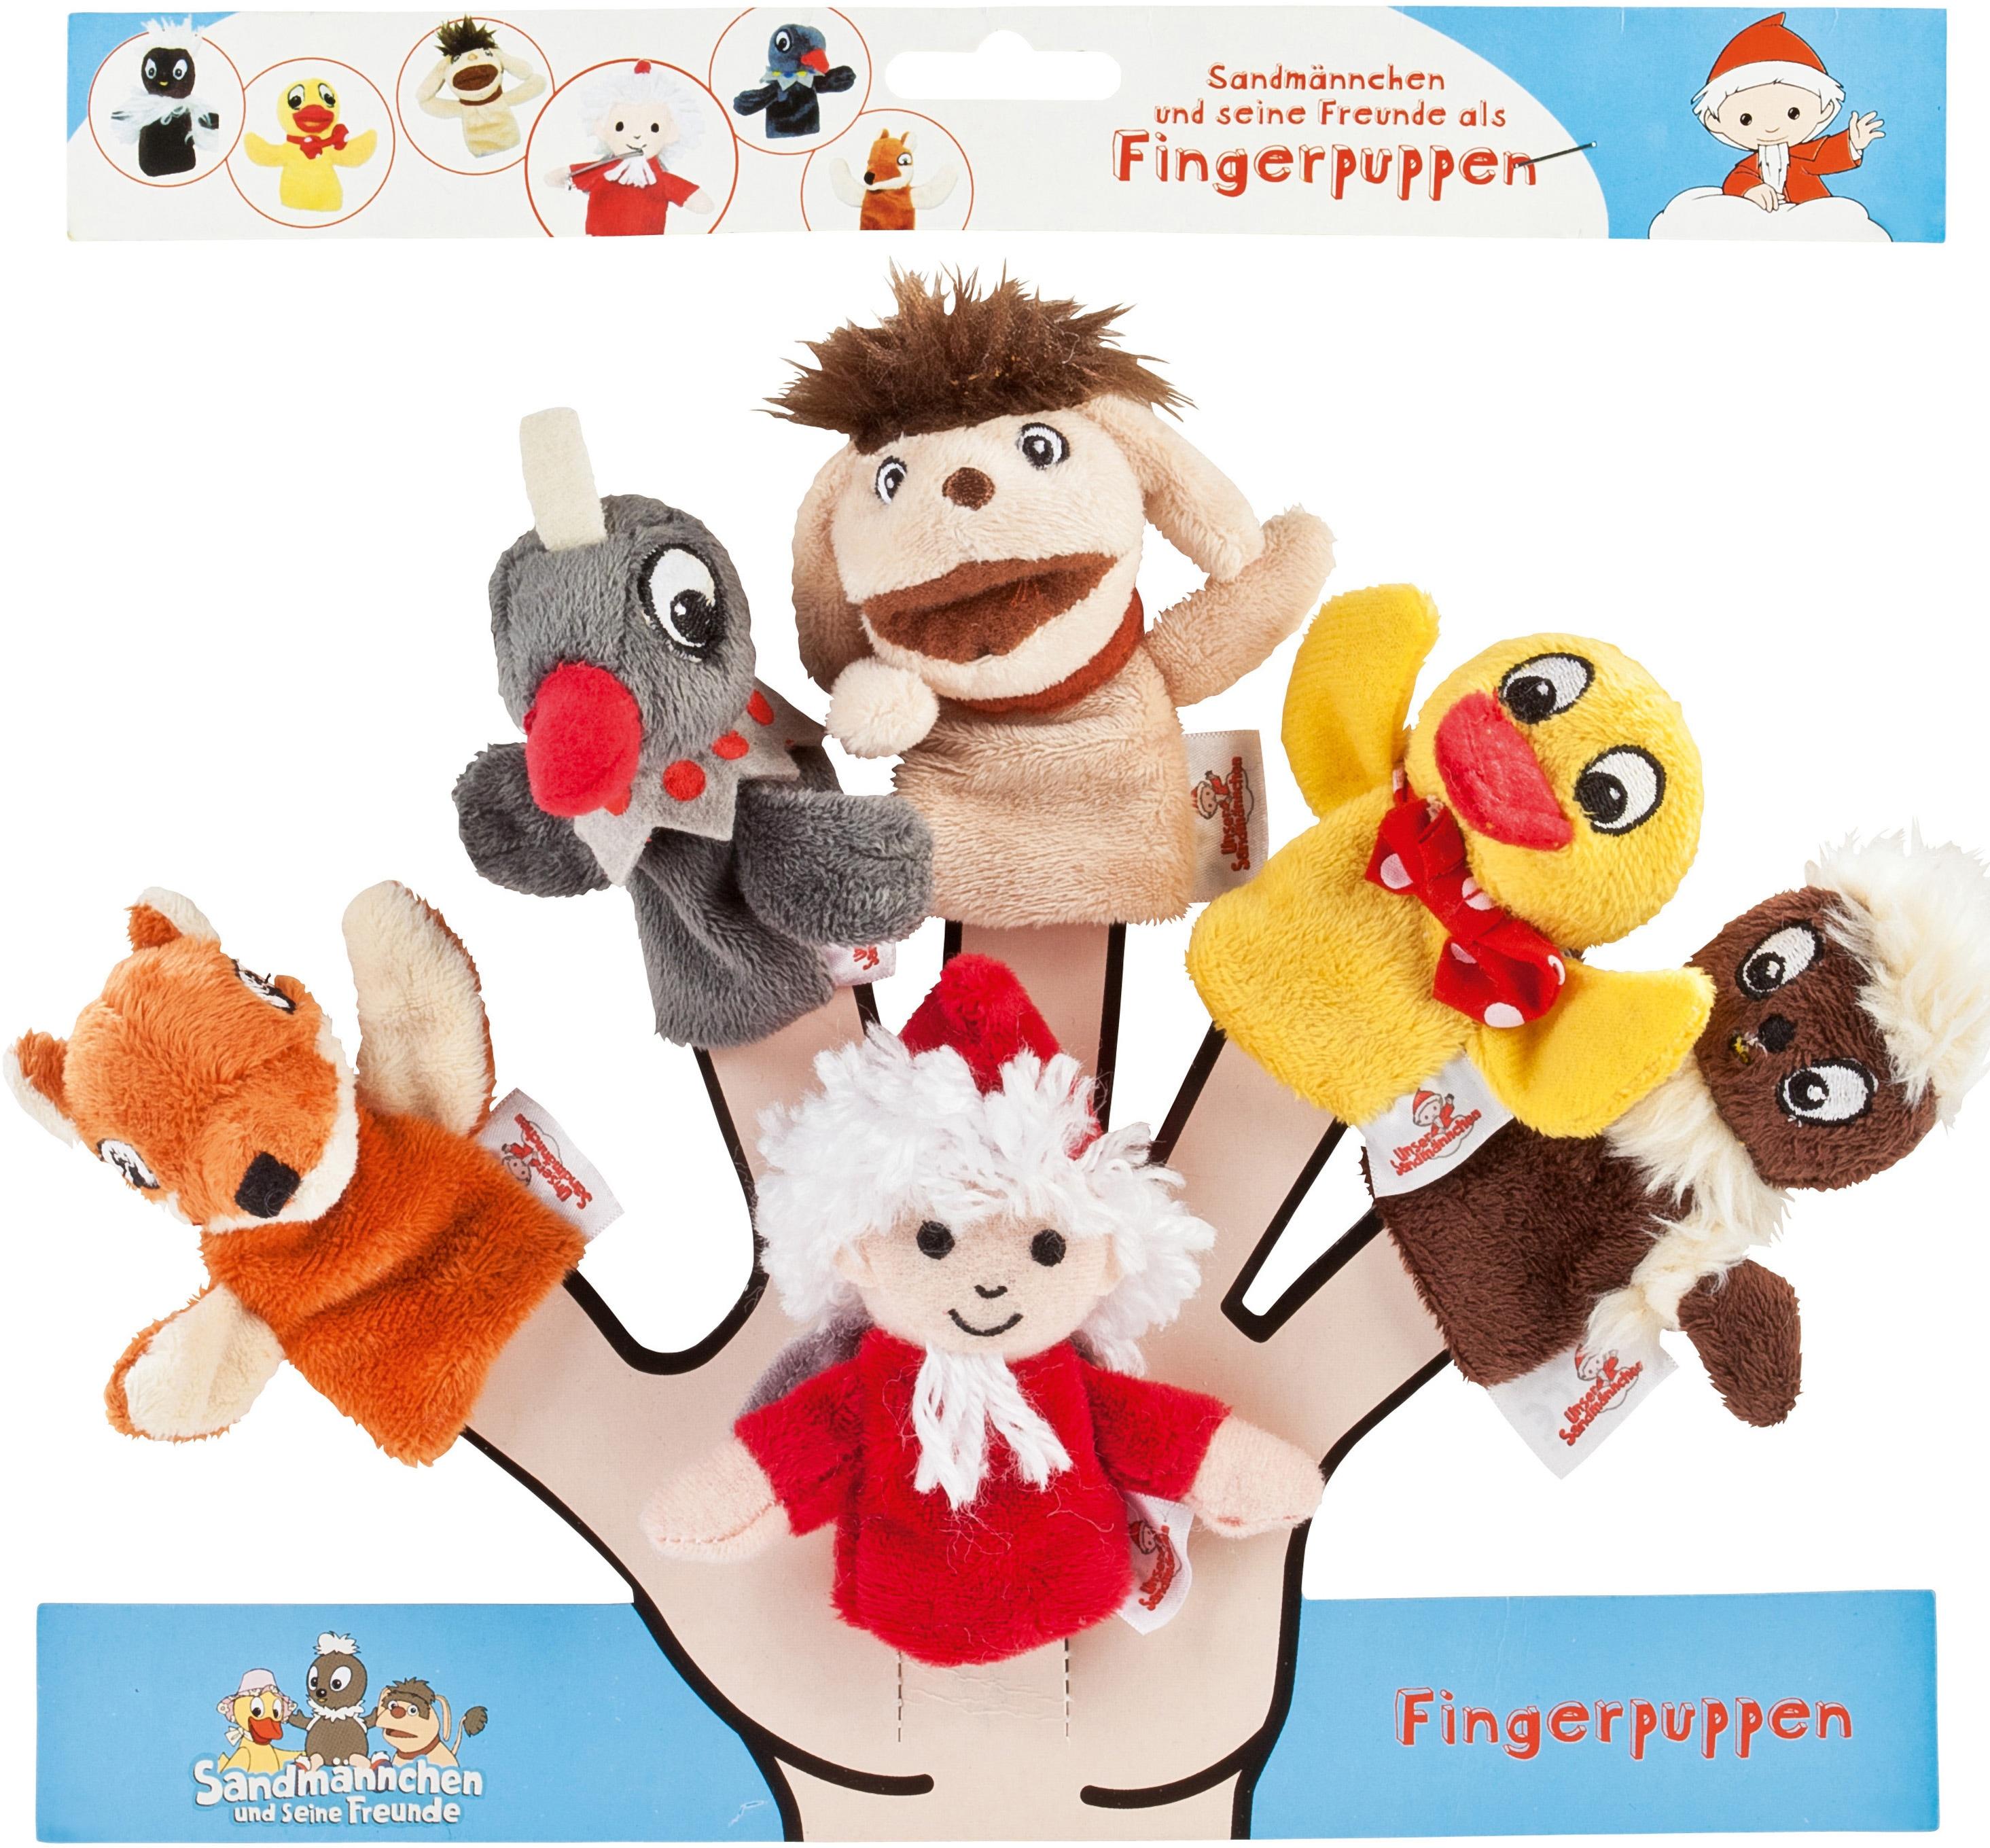 Heunec Fingerpuppe Sandmann Fingerpuppen 6er-Set, (Set, 6 tlg.) bunt Kinder Ab Geburt Altersempfehlung